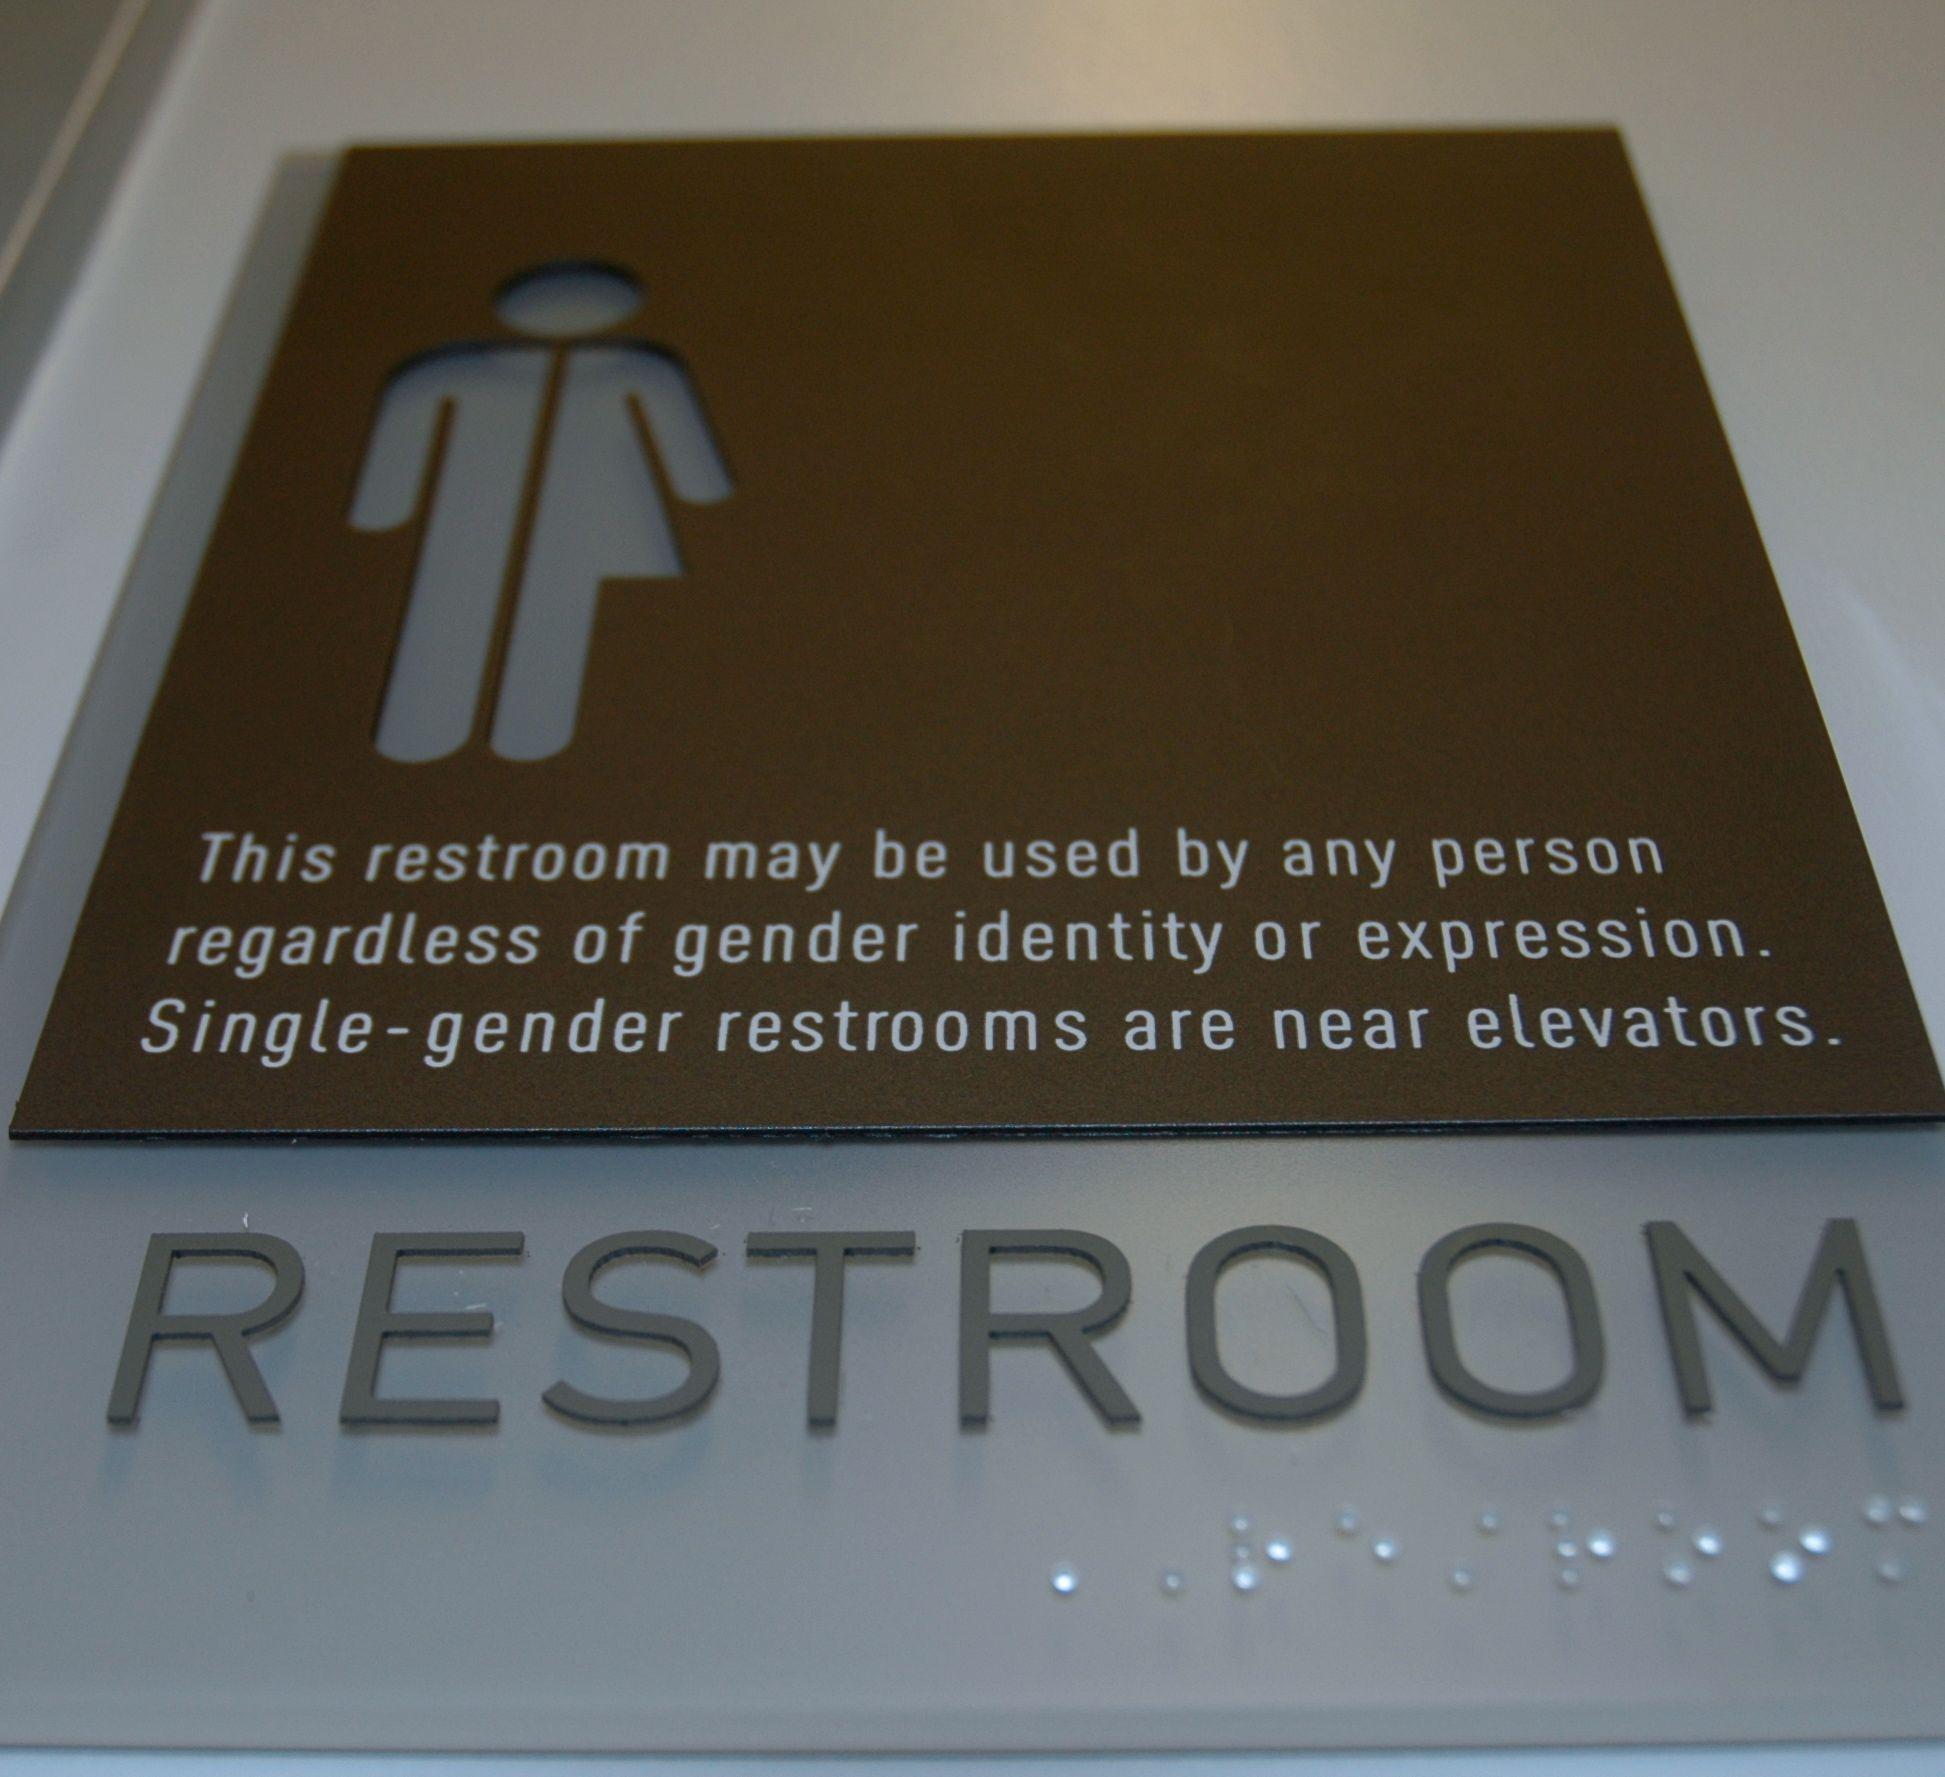 Bathroom Signs Transgender transgender restroom sign - ada compliant | my style | pinterest